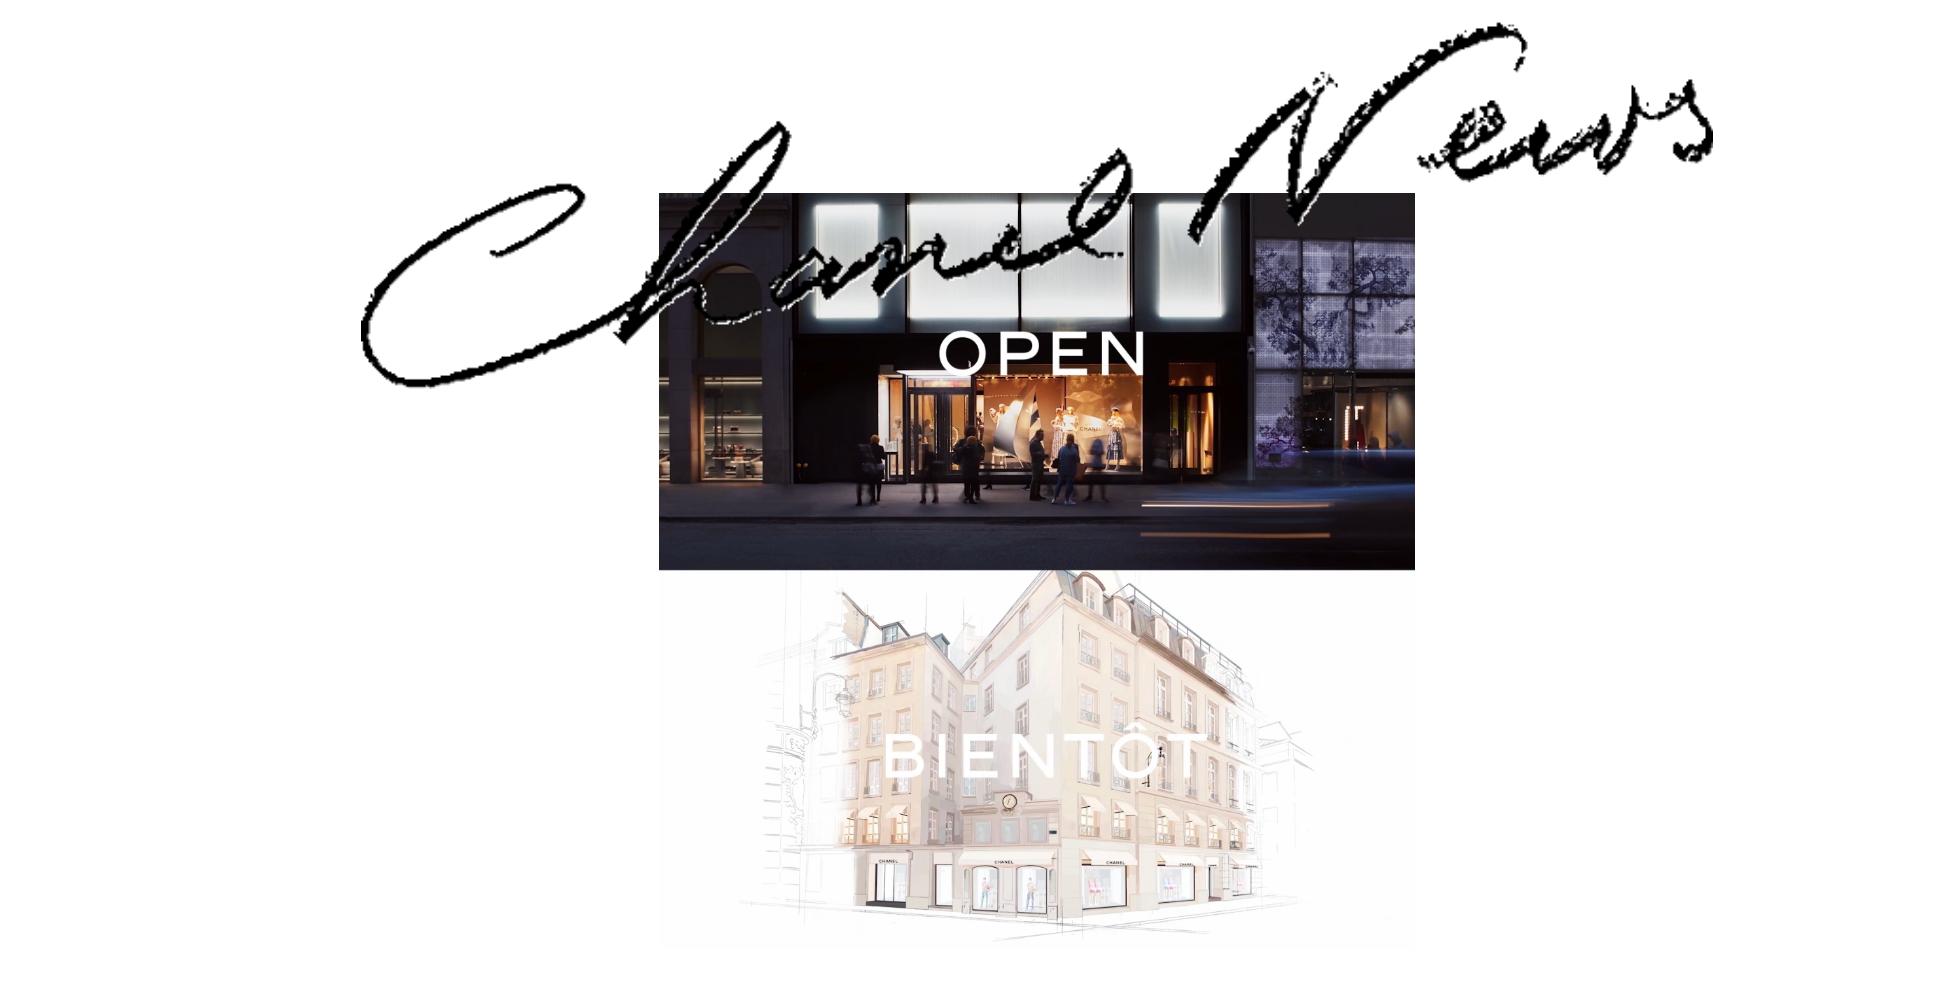 Chanel耗時6年打造的巴黎最大旗艦店終開業,成為品牌數位化創新的最新試驗點_(1).png